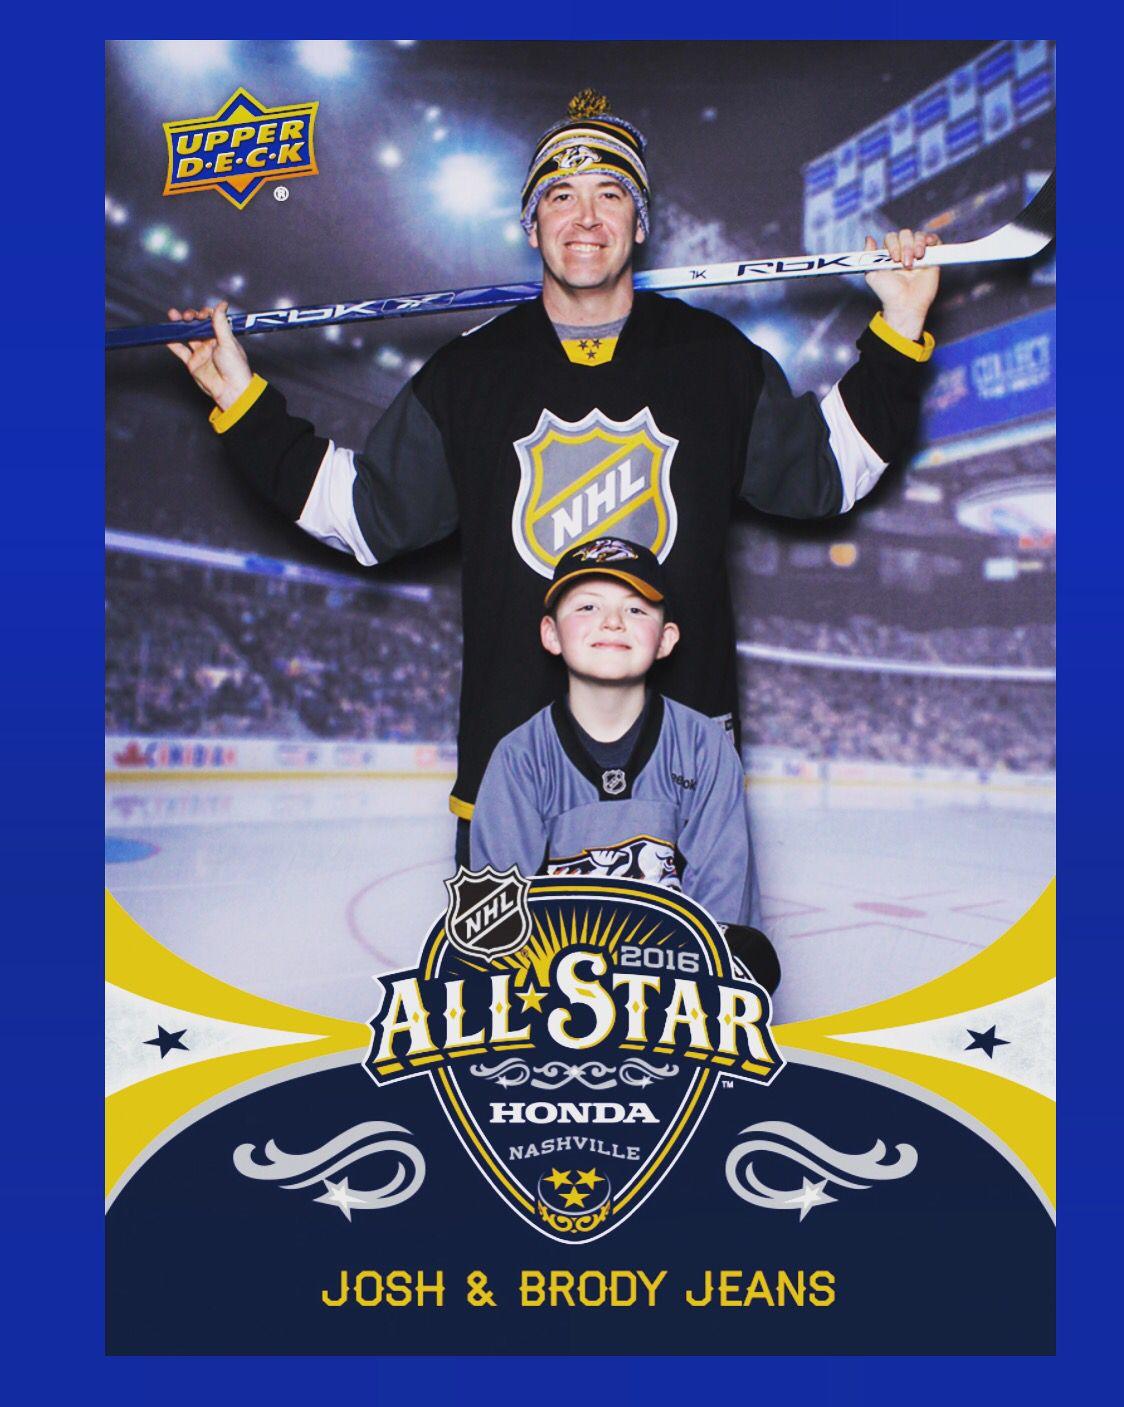 Me And Brody Got An Upper Deck Hockey Card Made At Nhl All Star Fan Fest Hockey Cards Upper Deck Nhl